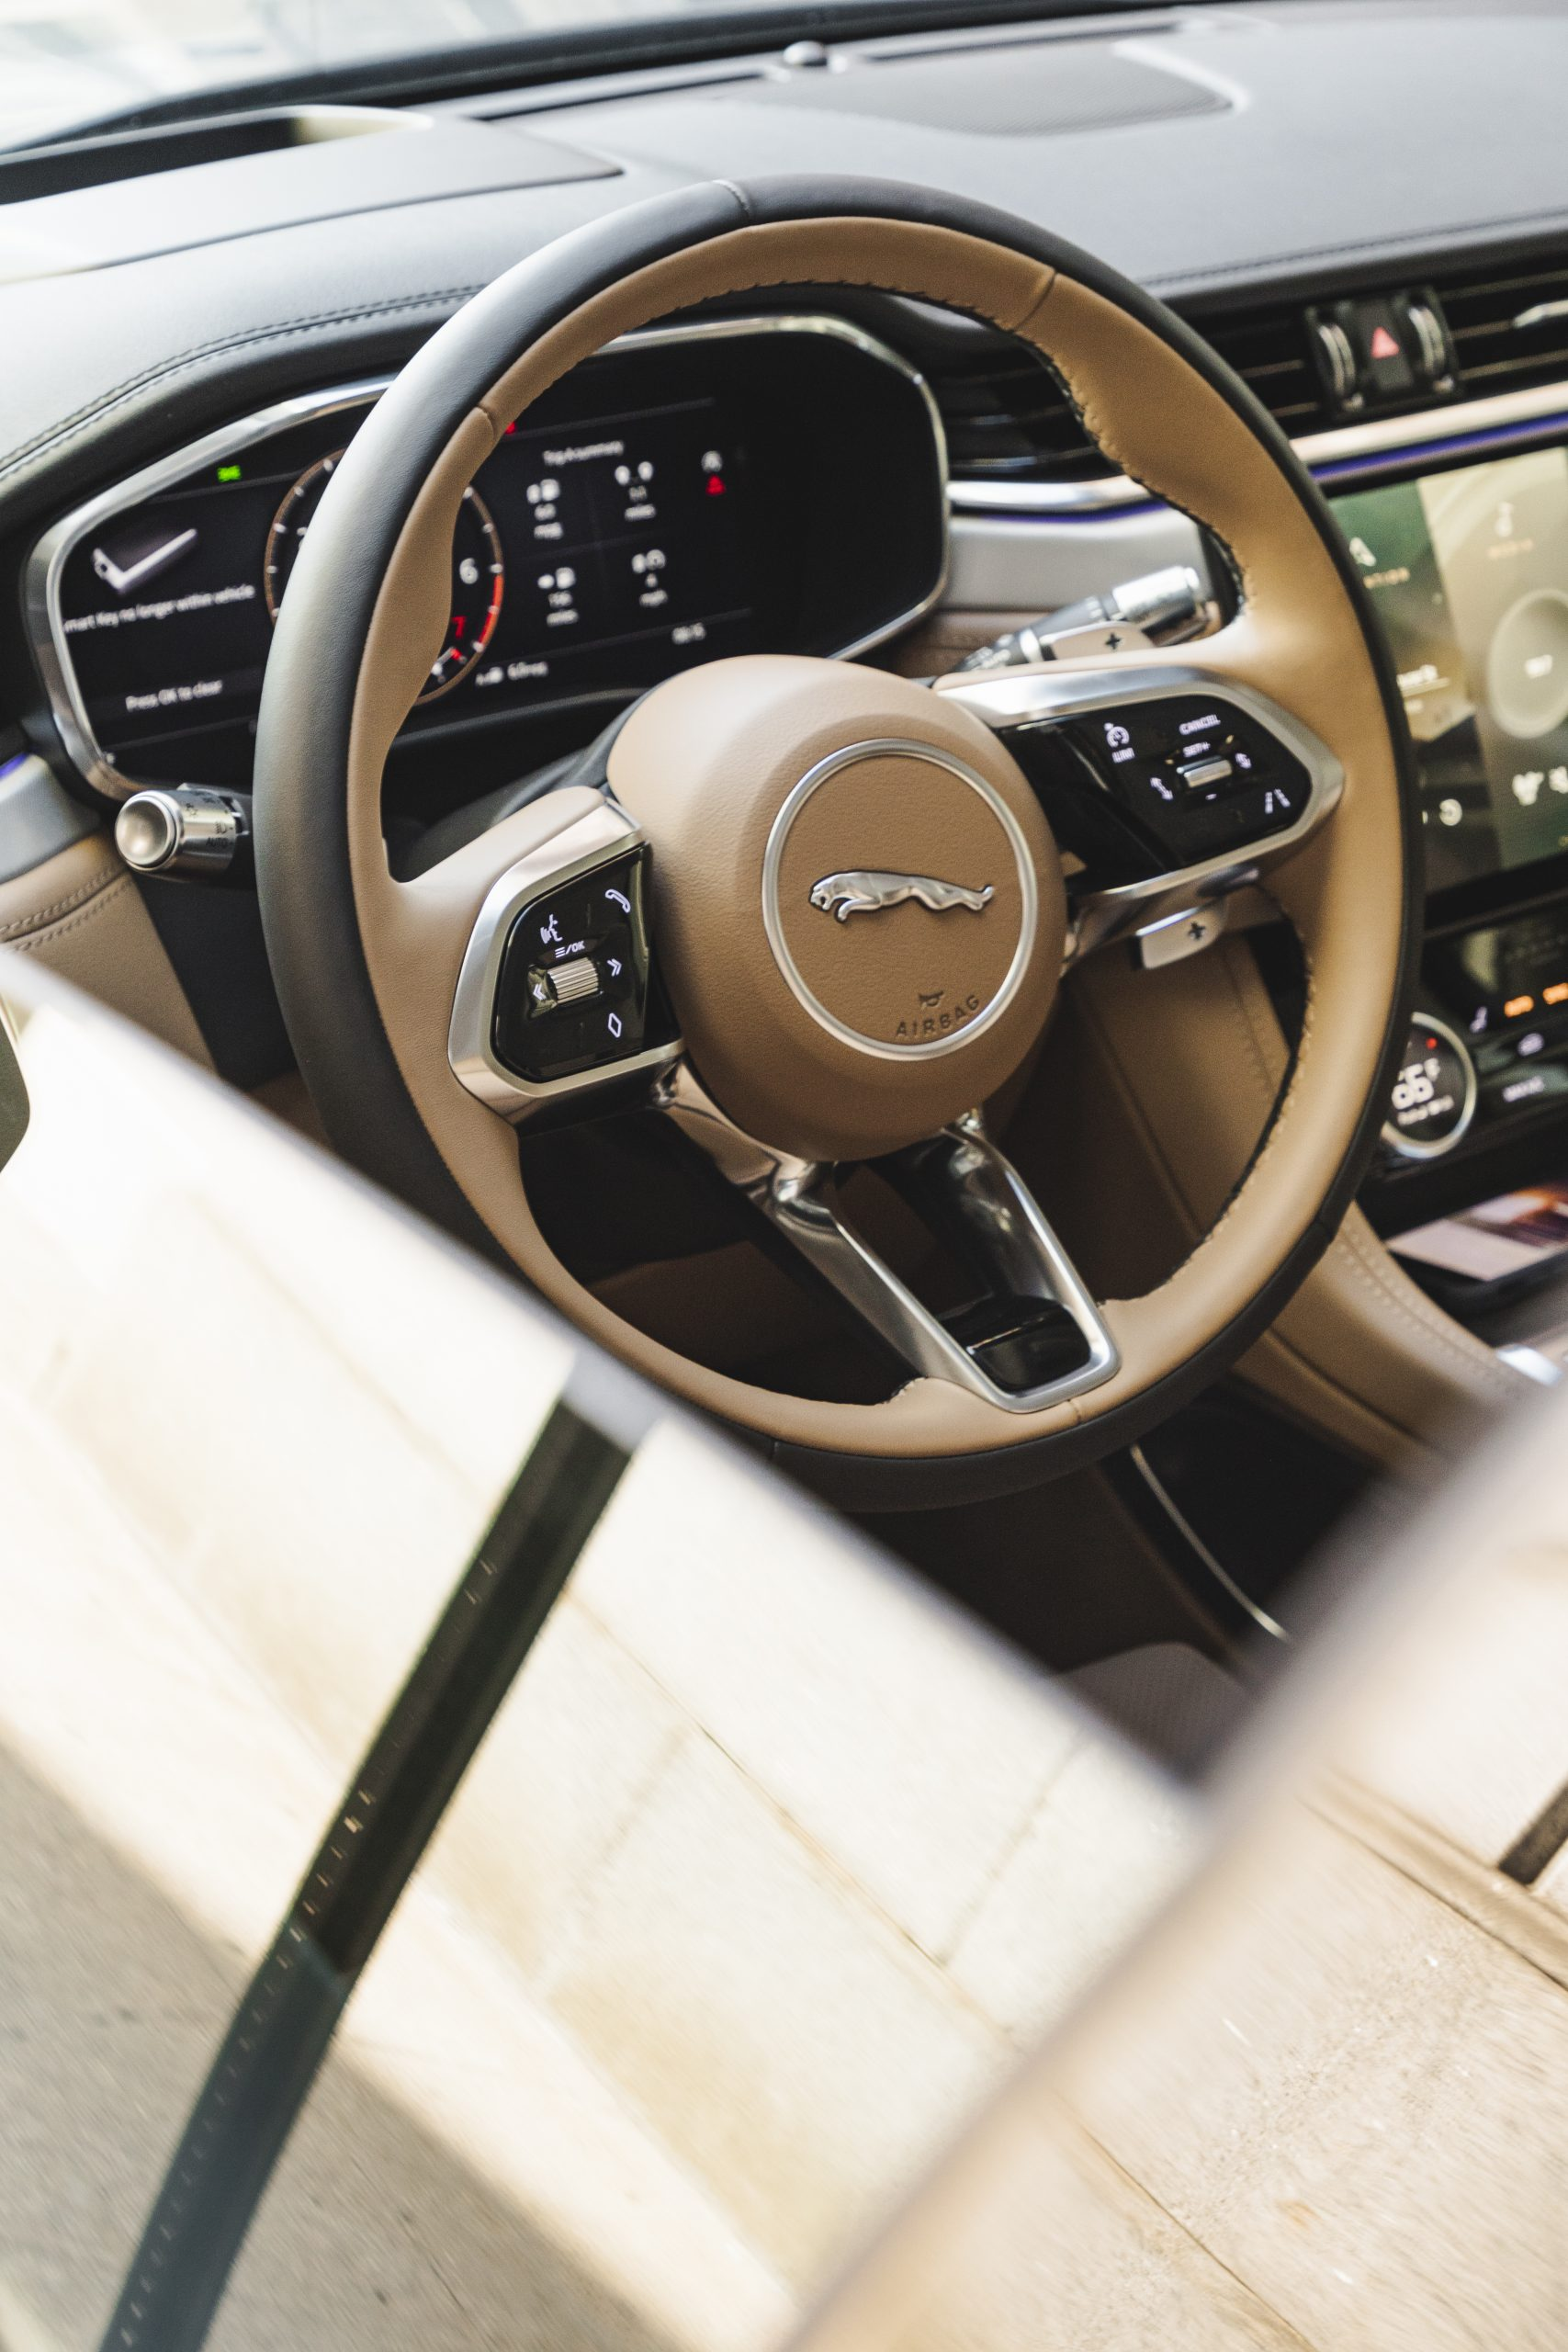 2021 Jaguar F-PACE S P340 steering wheel